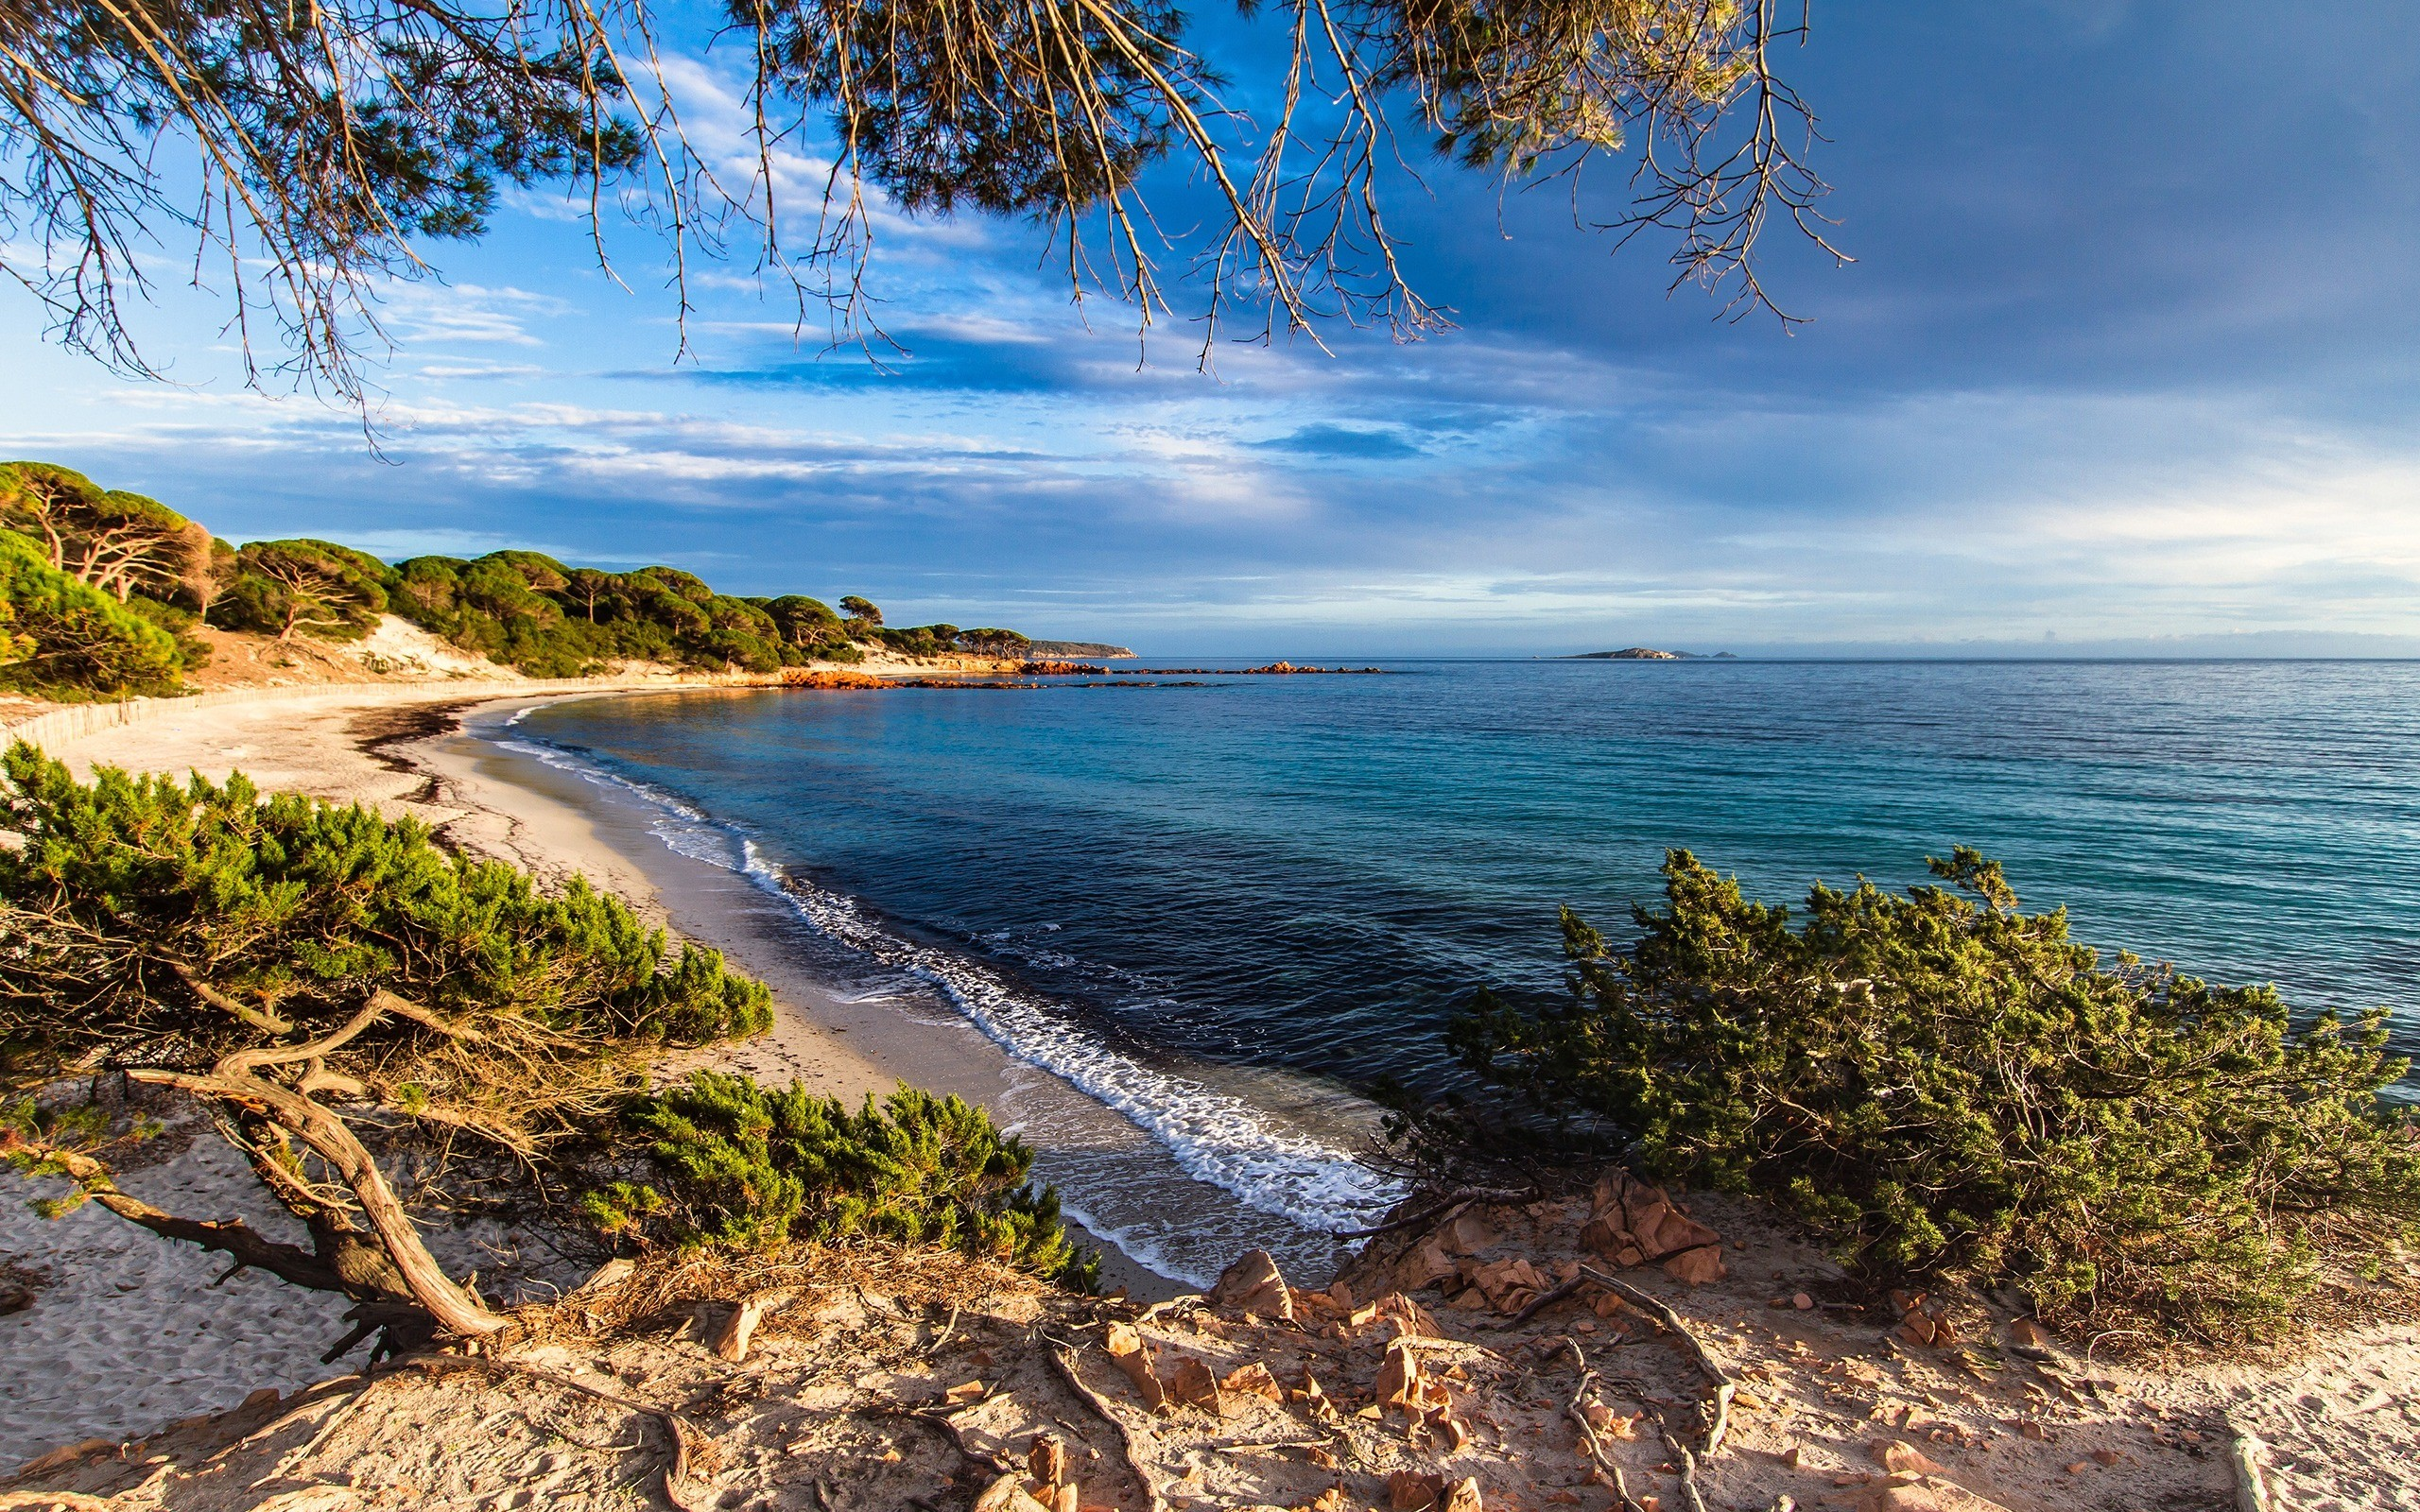 Res: 2560x1600, Corsica, Mediterranean Sea, France, beach, morning, sunrise, coast